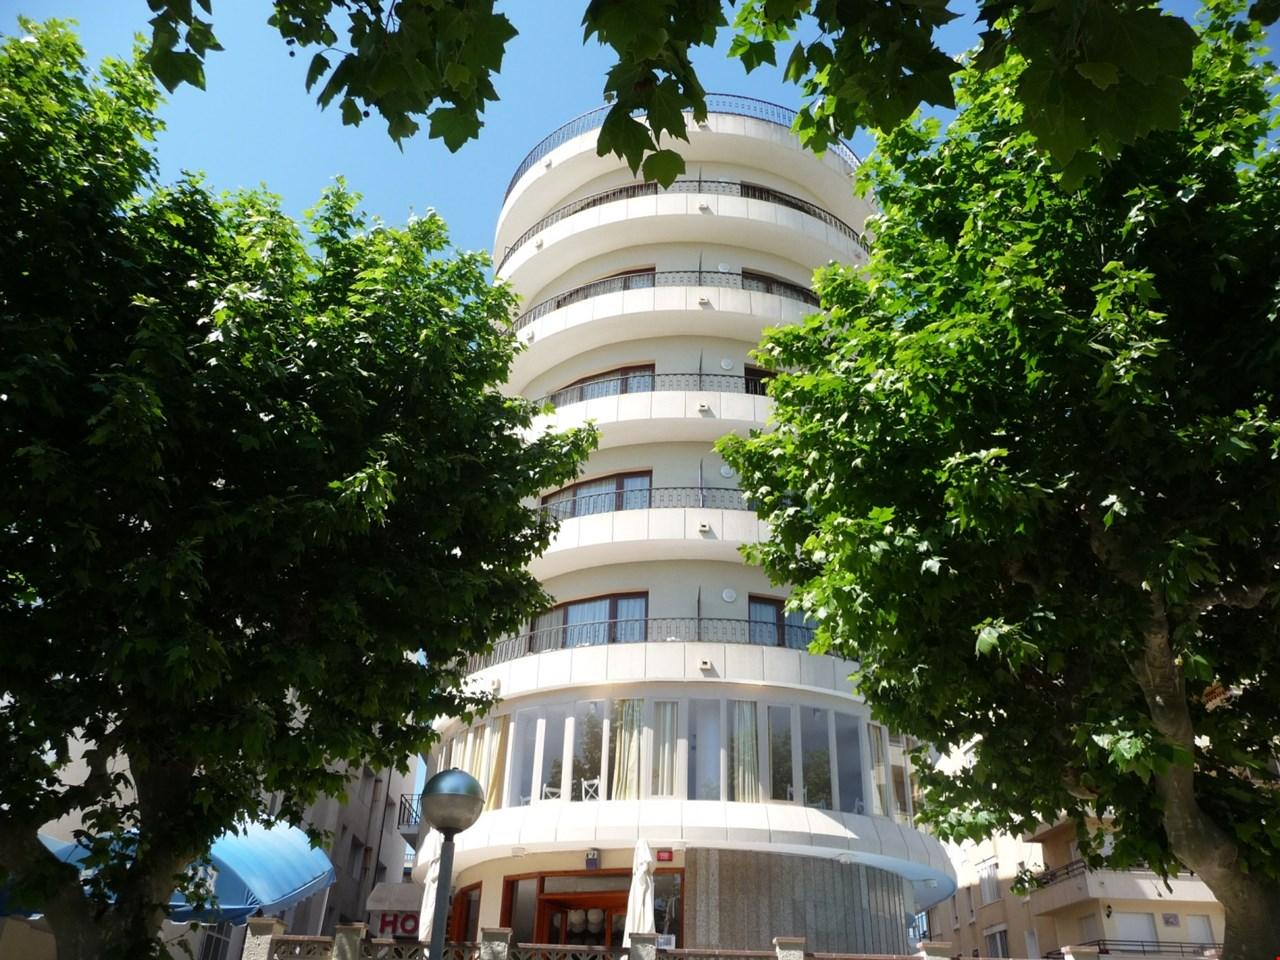 Haromar Hotel, Costa Brava Spanyolország – last minute, all inclusive